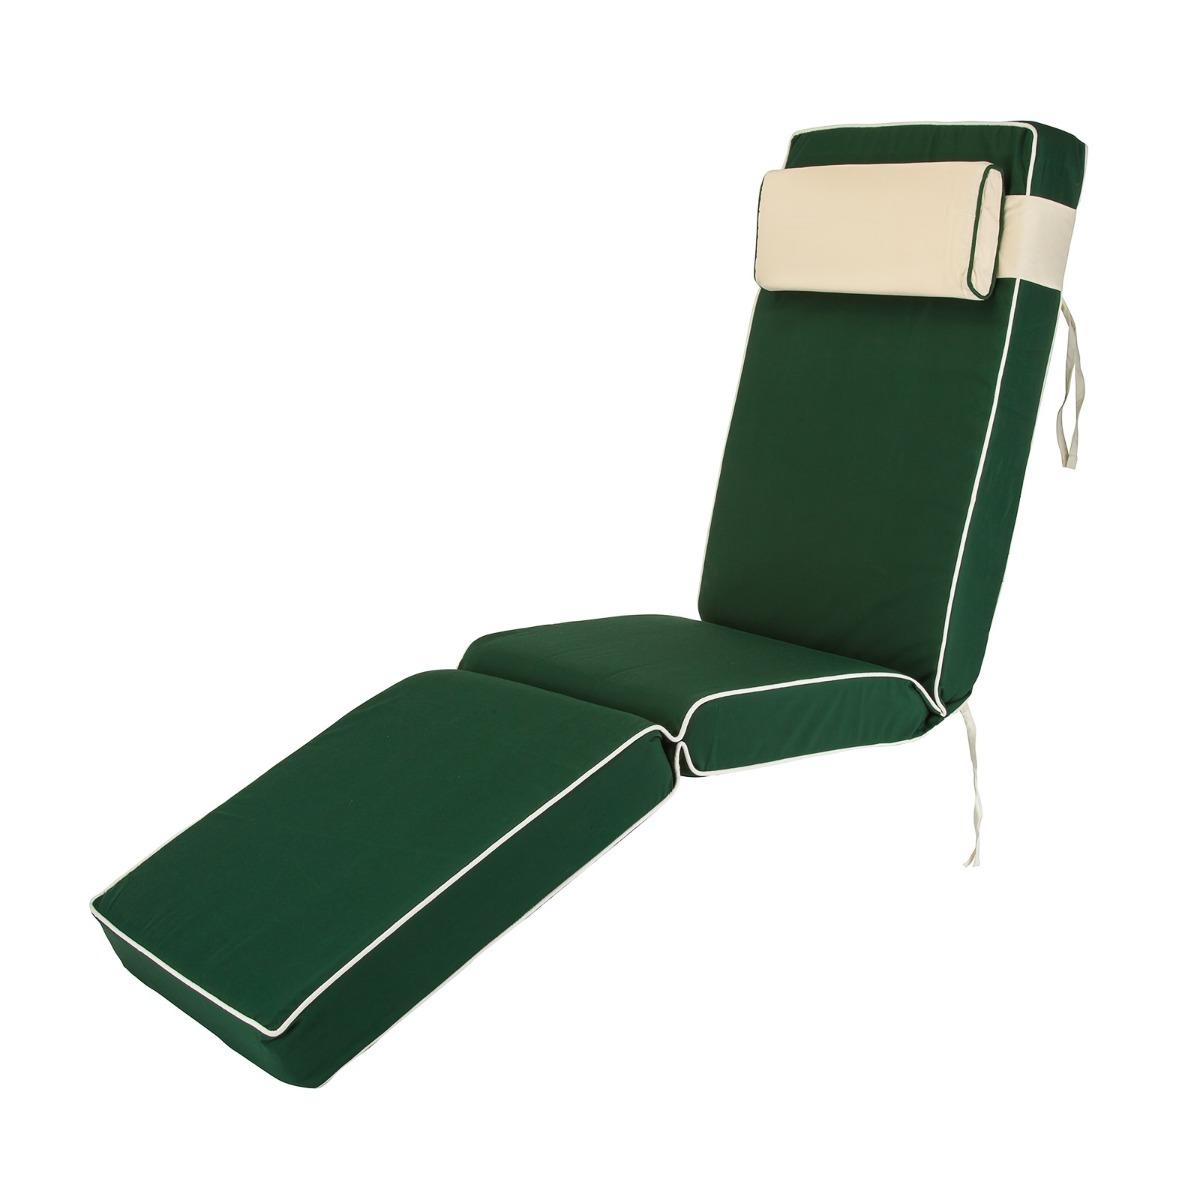 Luxury Green Sun Lounger